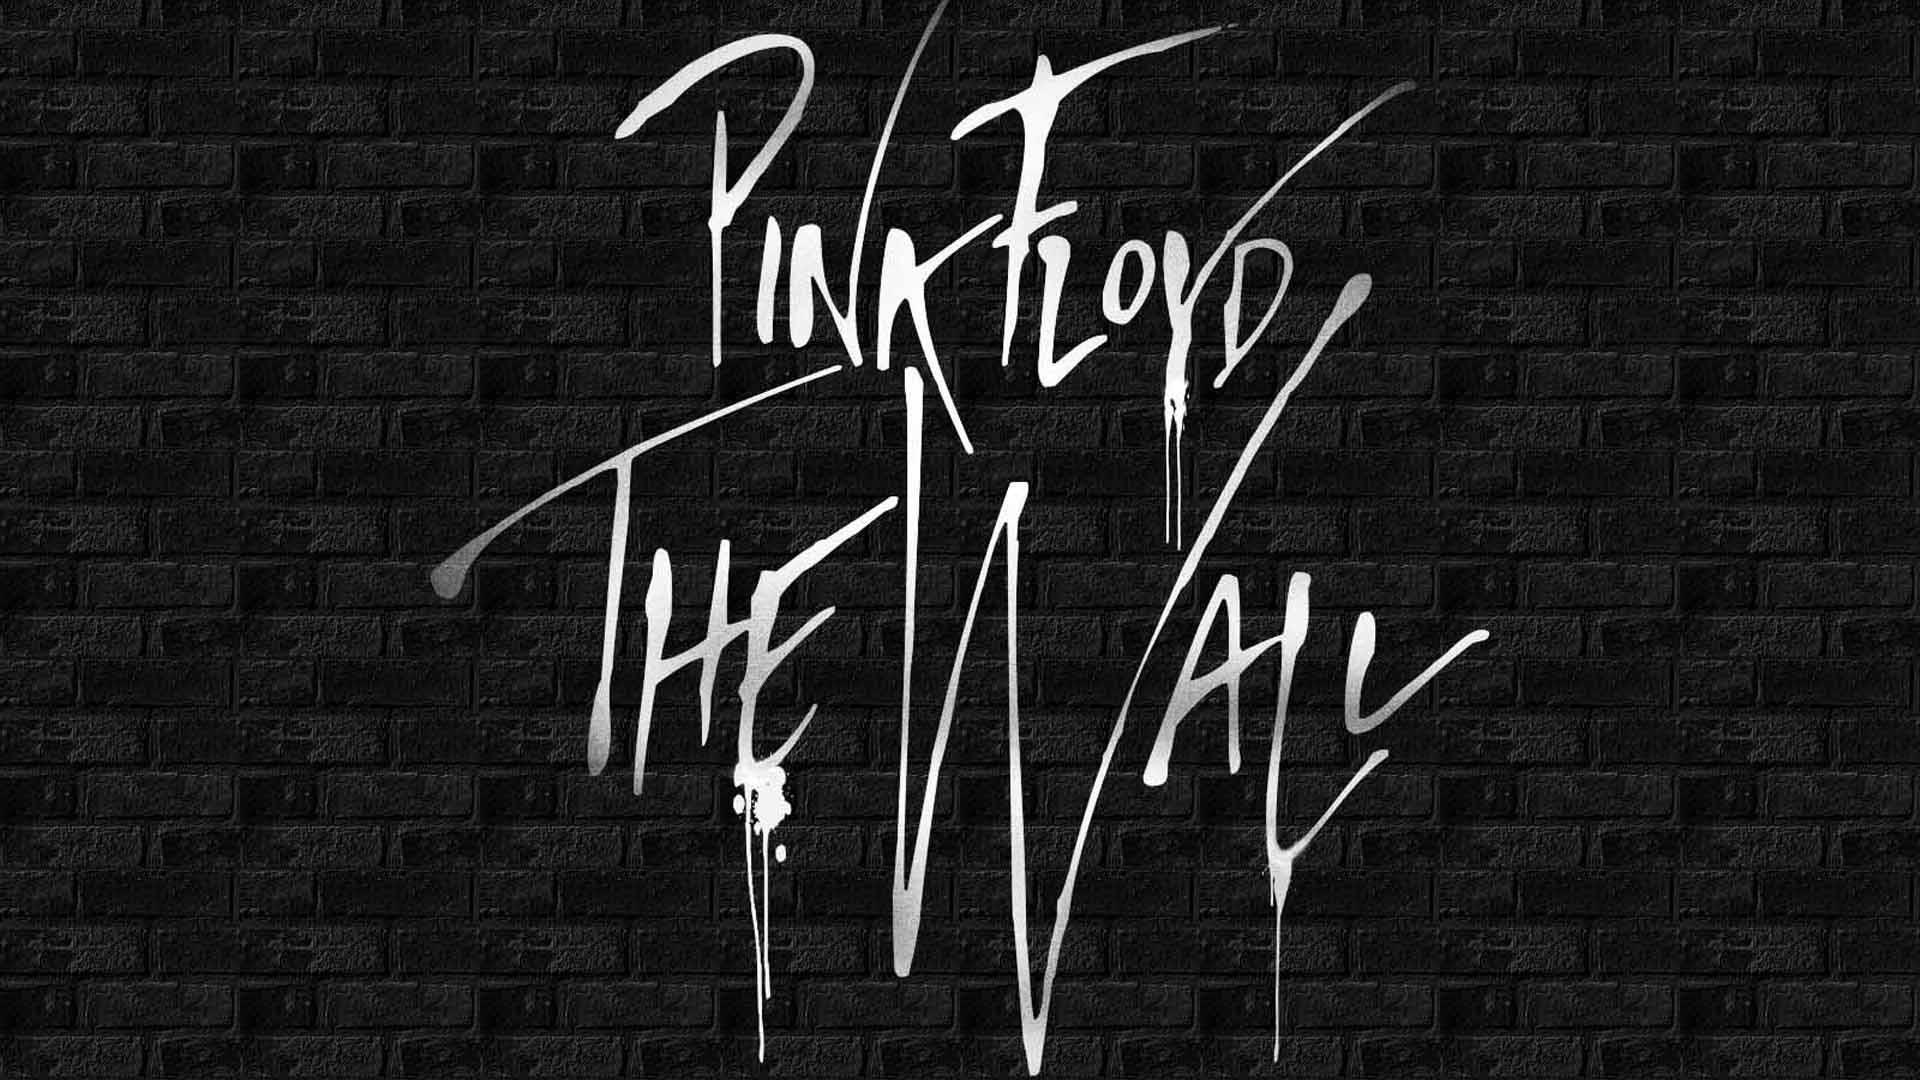 … Pink Floyd The Wall Alternative Full HD Wallpaper …